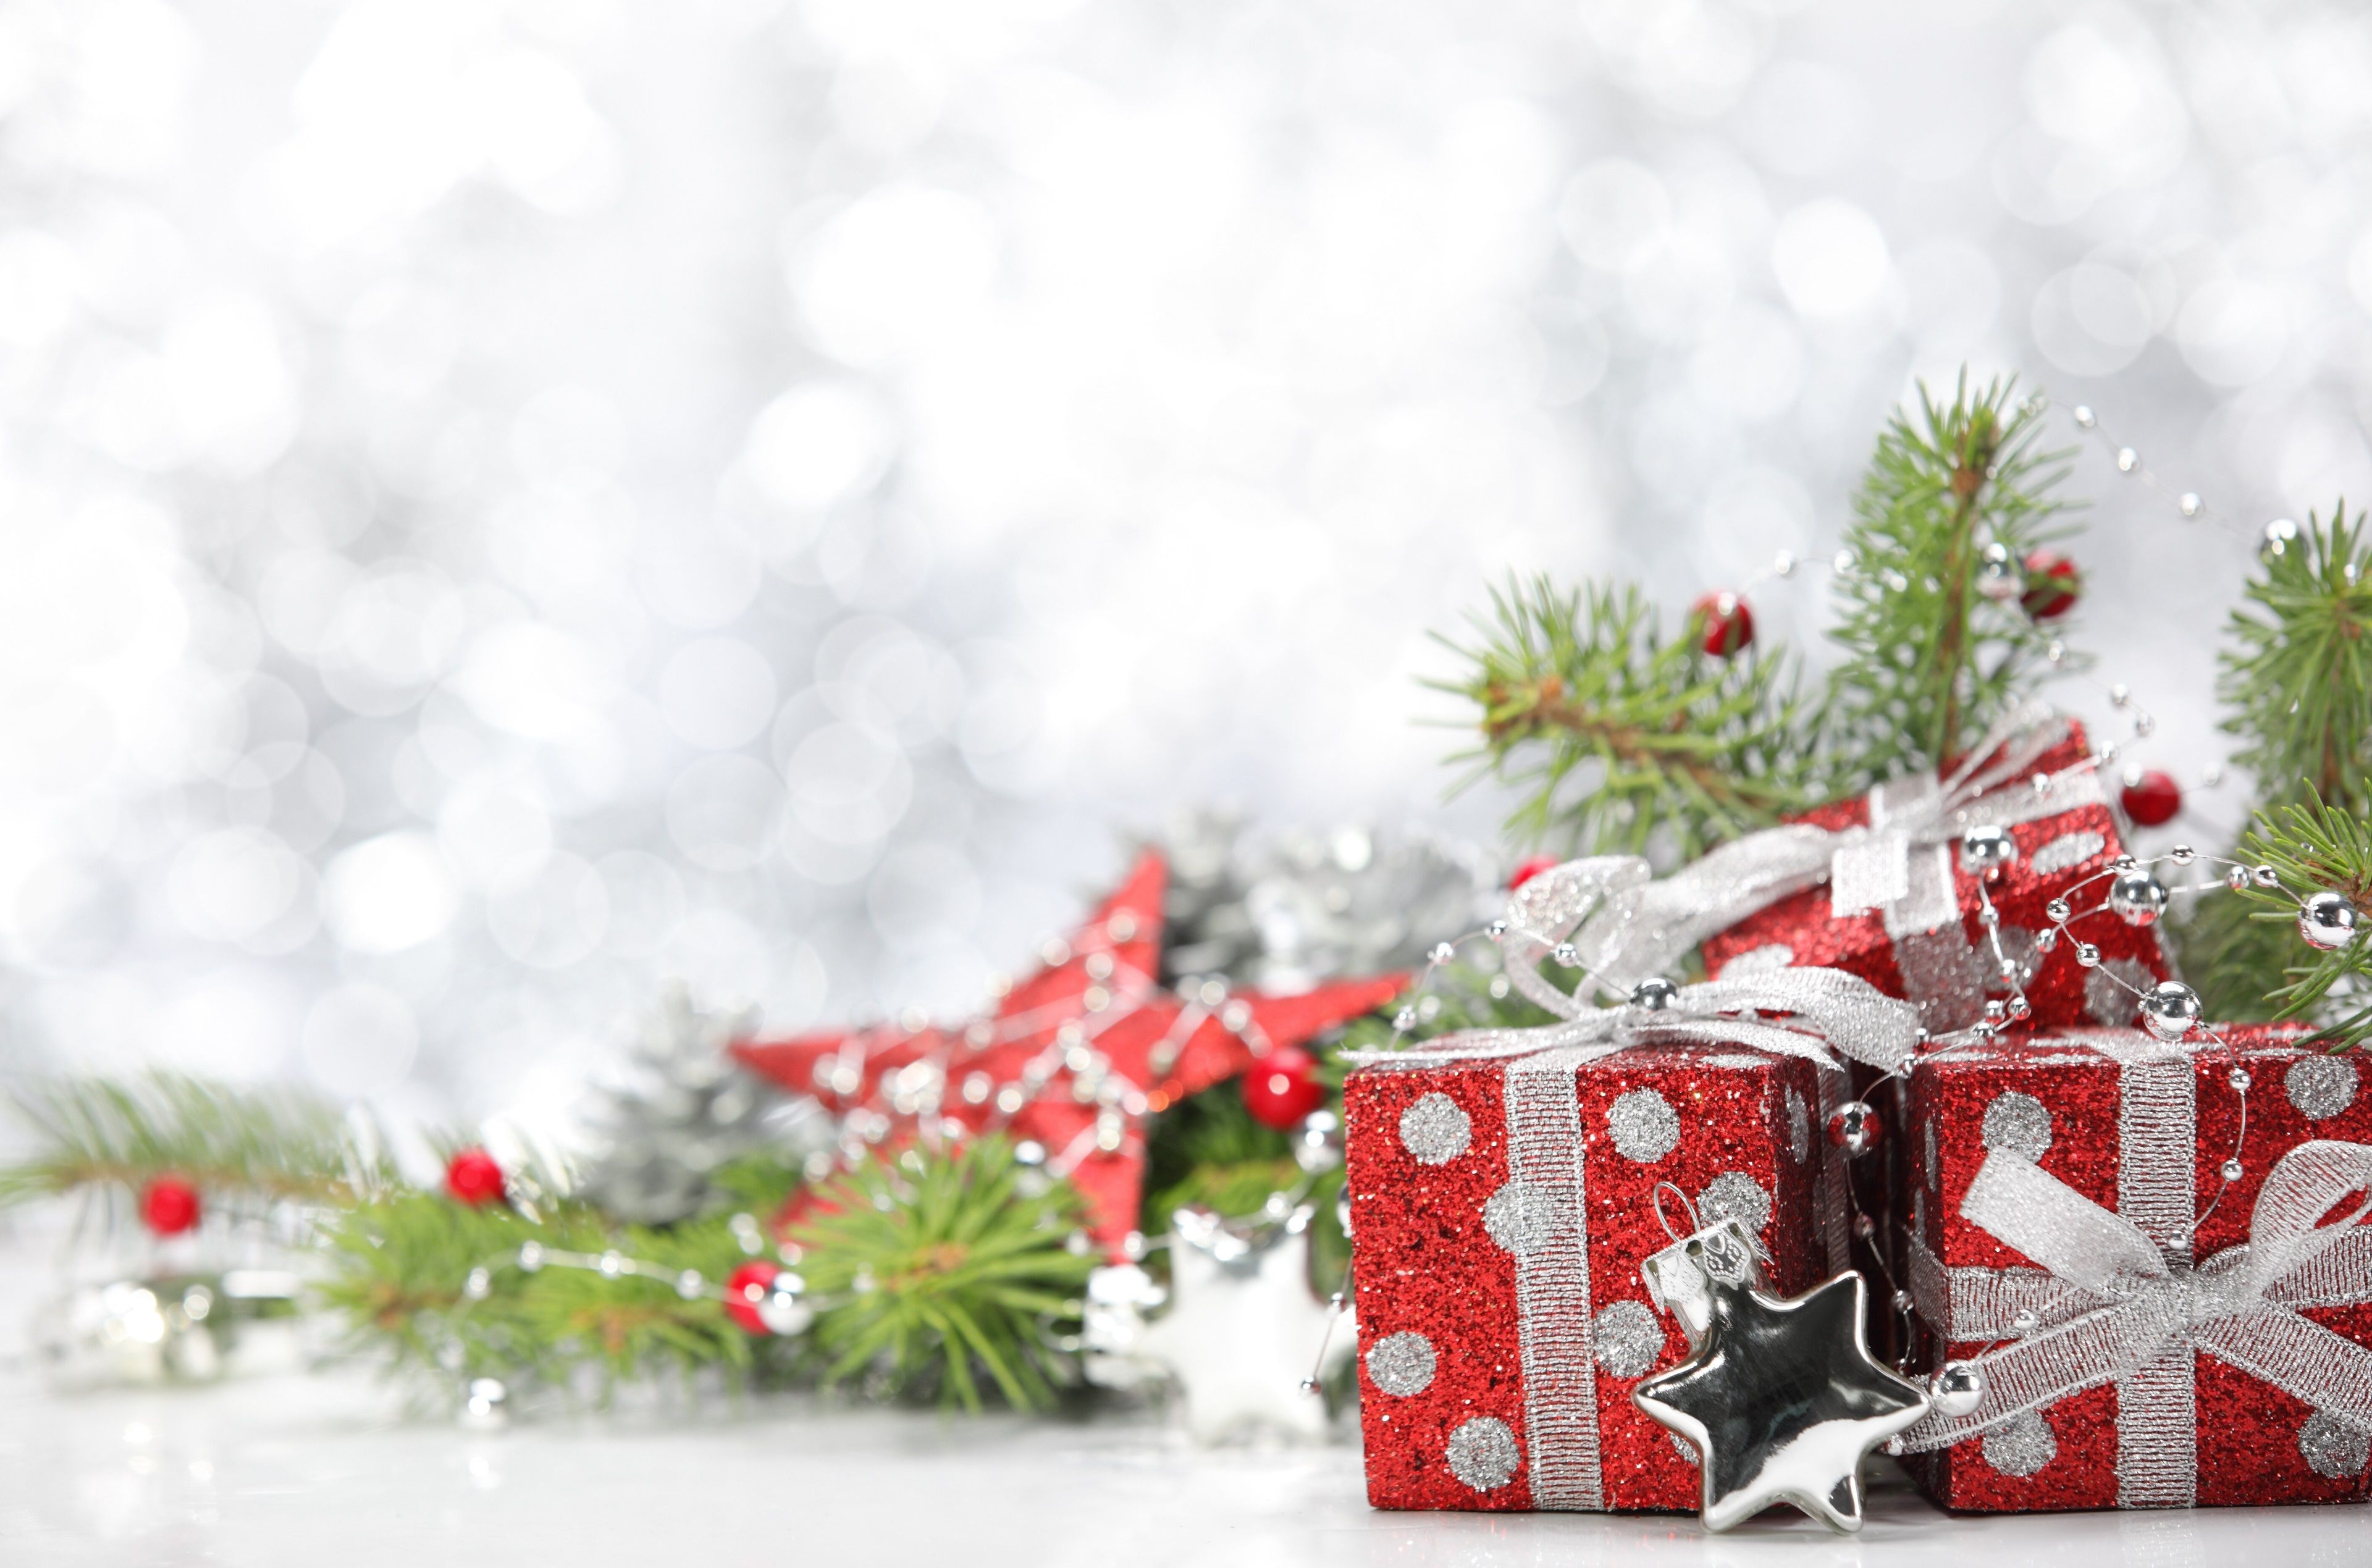 Desktop Wallpaper Images Christmas